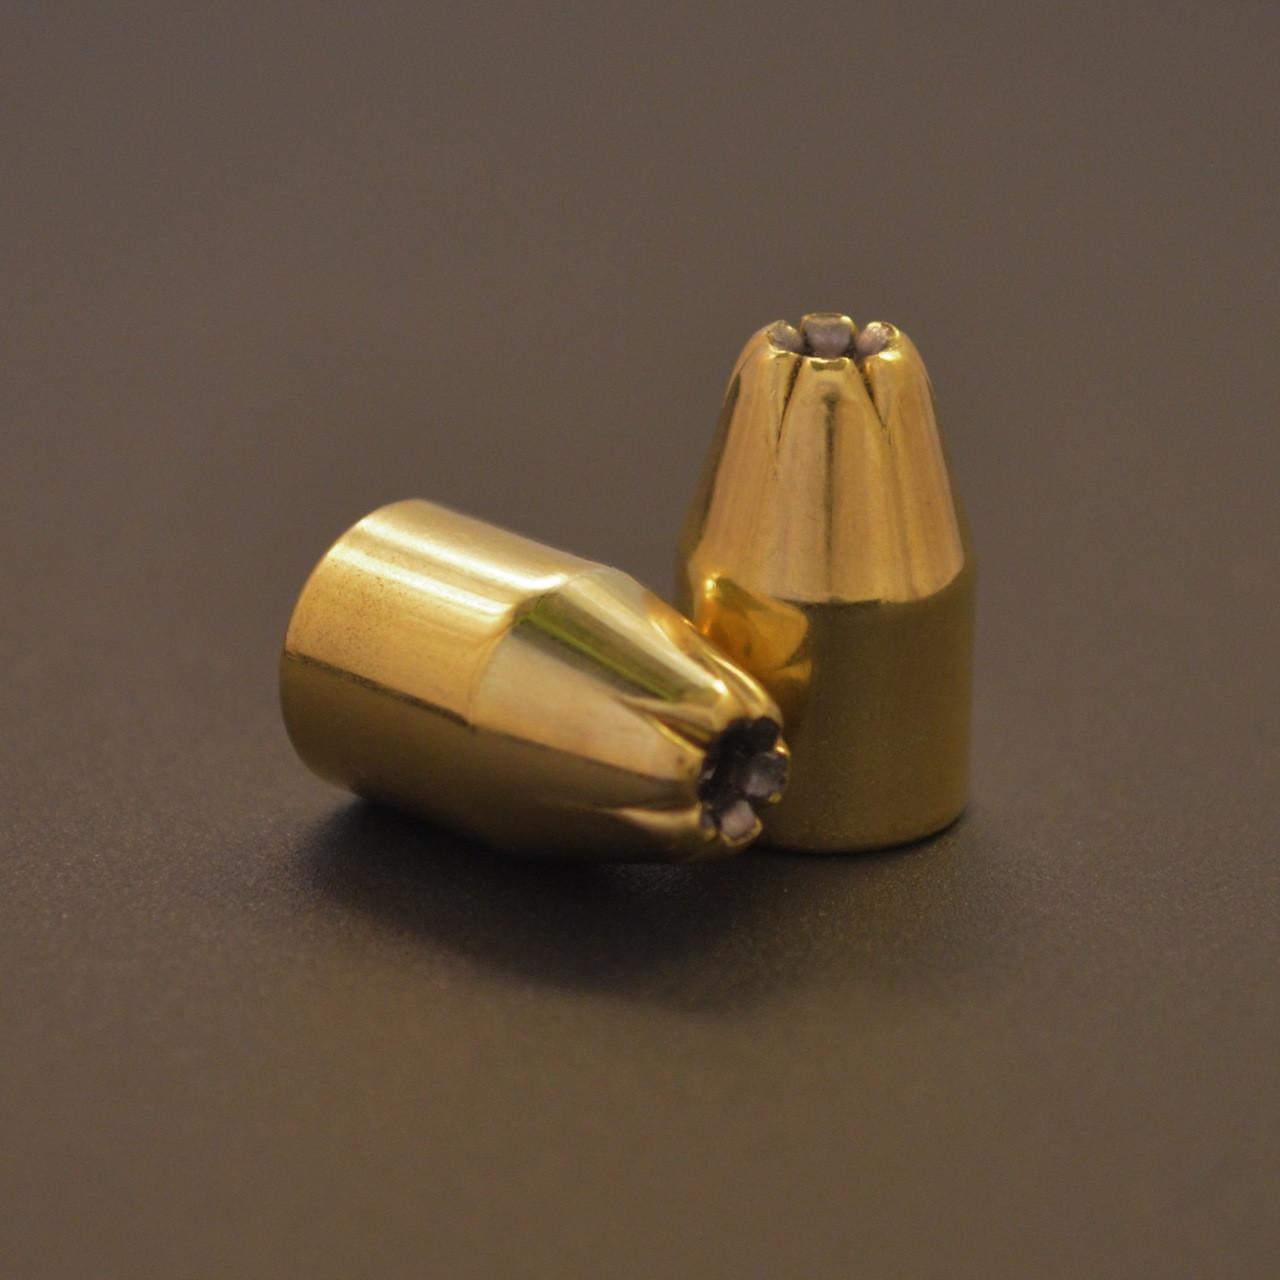 9mm/124gr JHP - 100ct